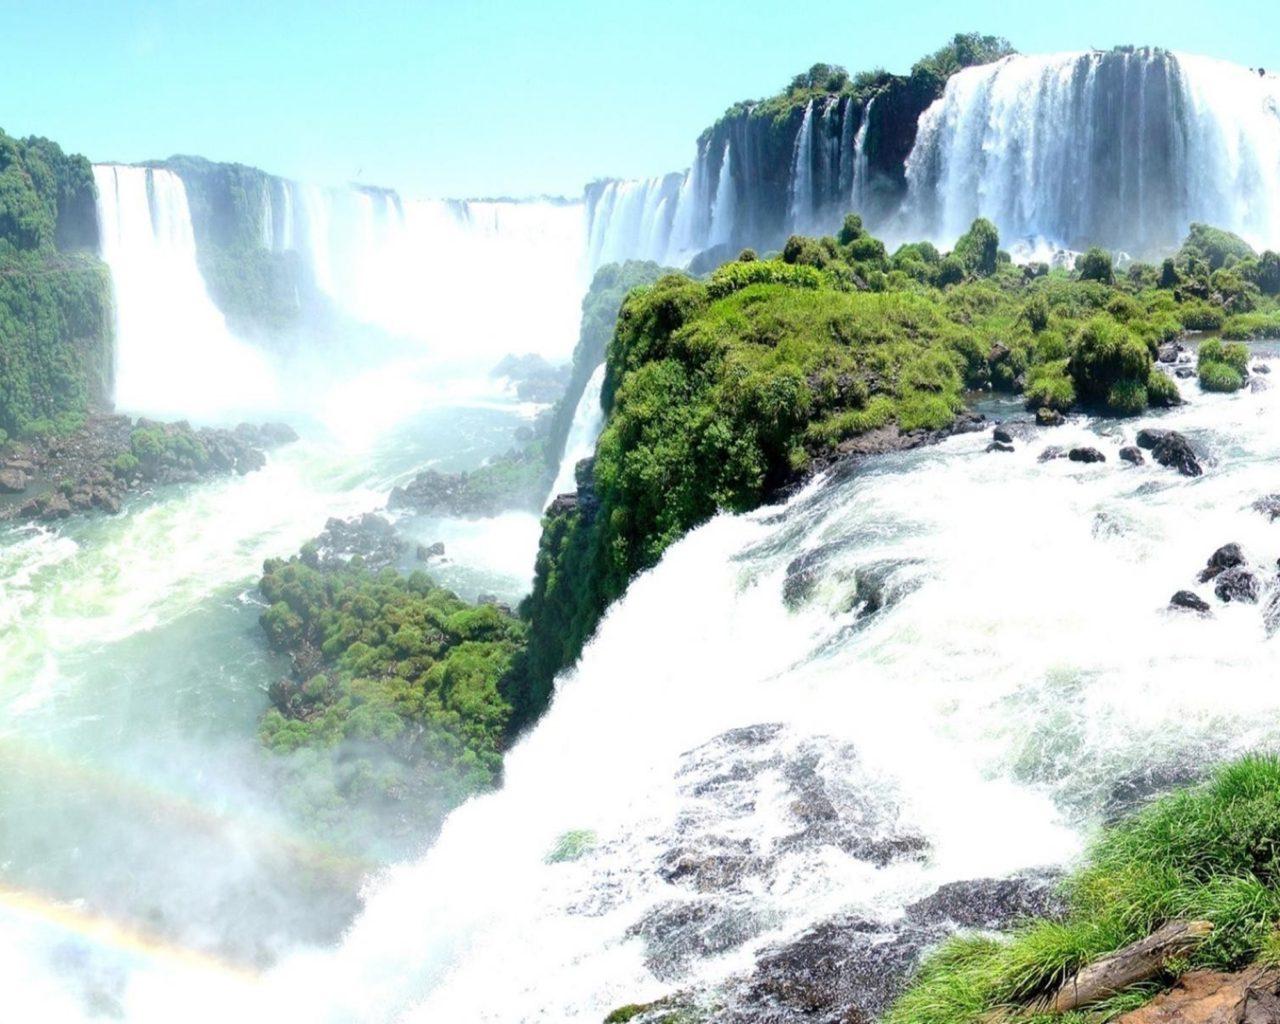 Yosemite Falls Wallpaper Landscape Waterfall Rocks Trees Hd Wallpaper Iguazu